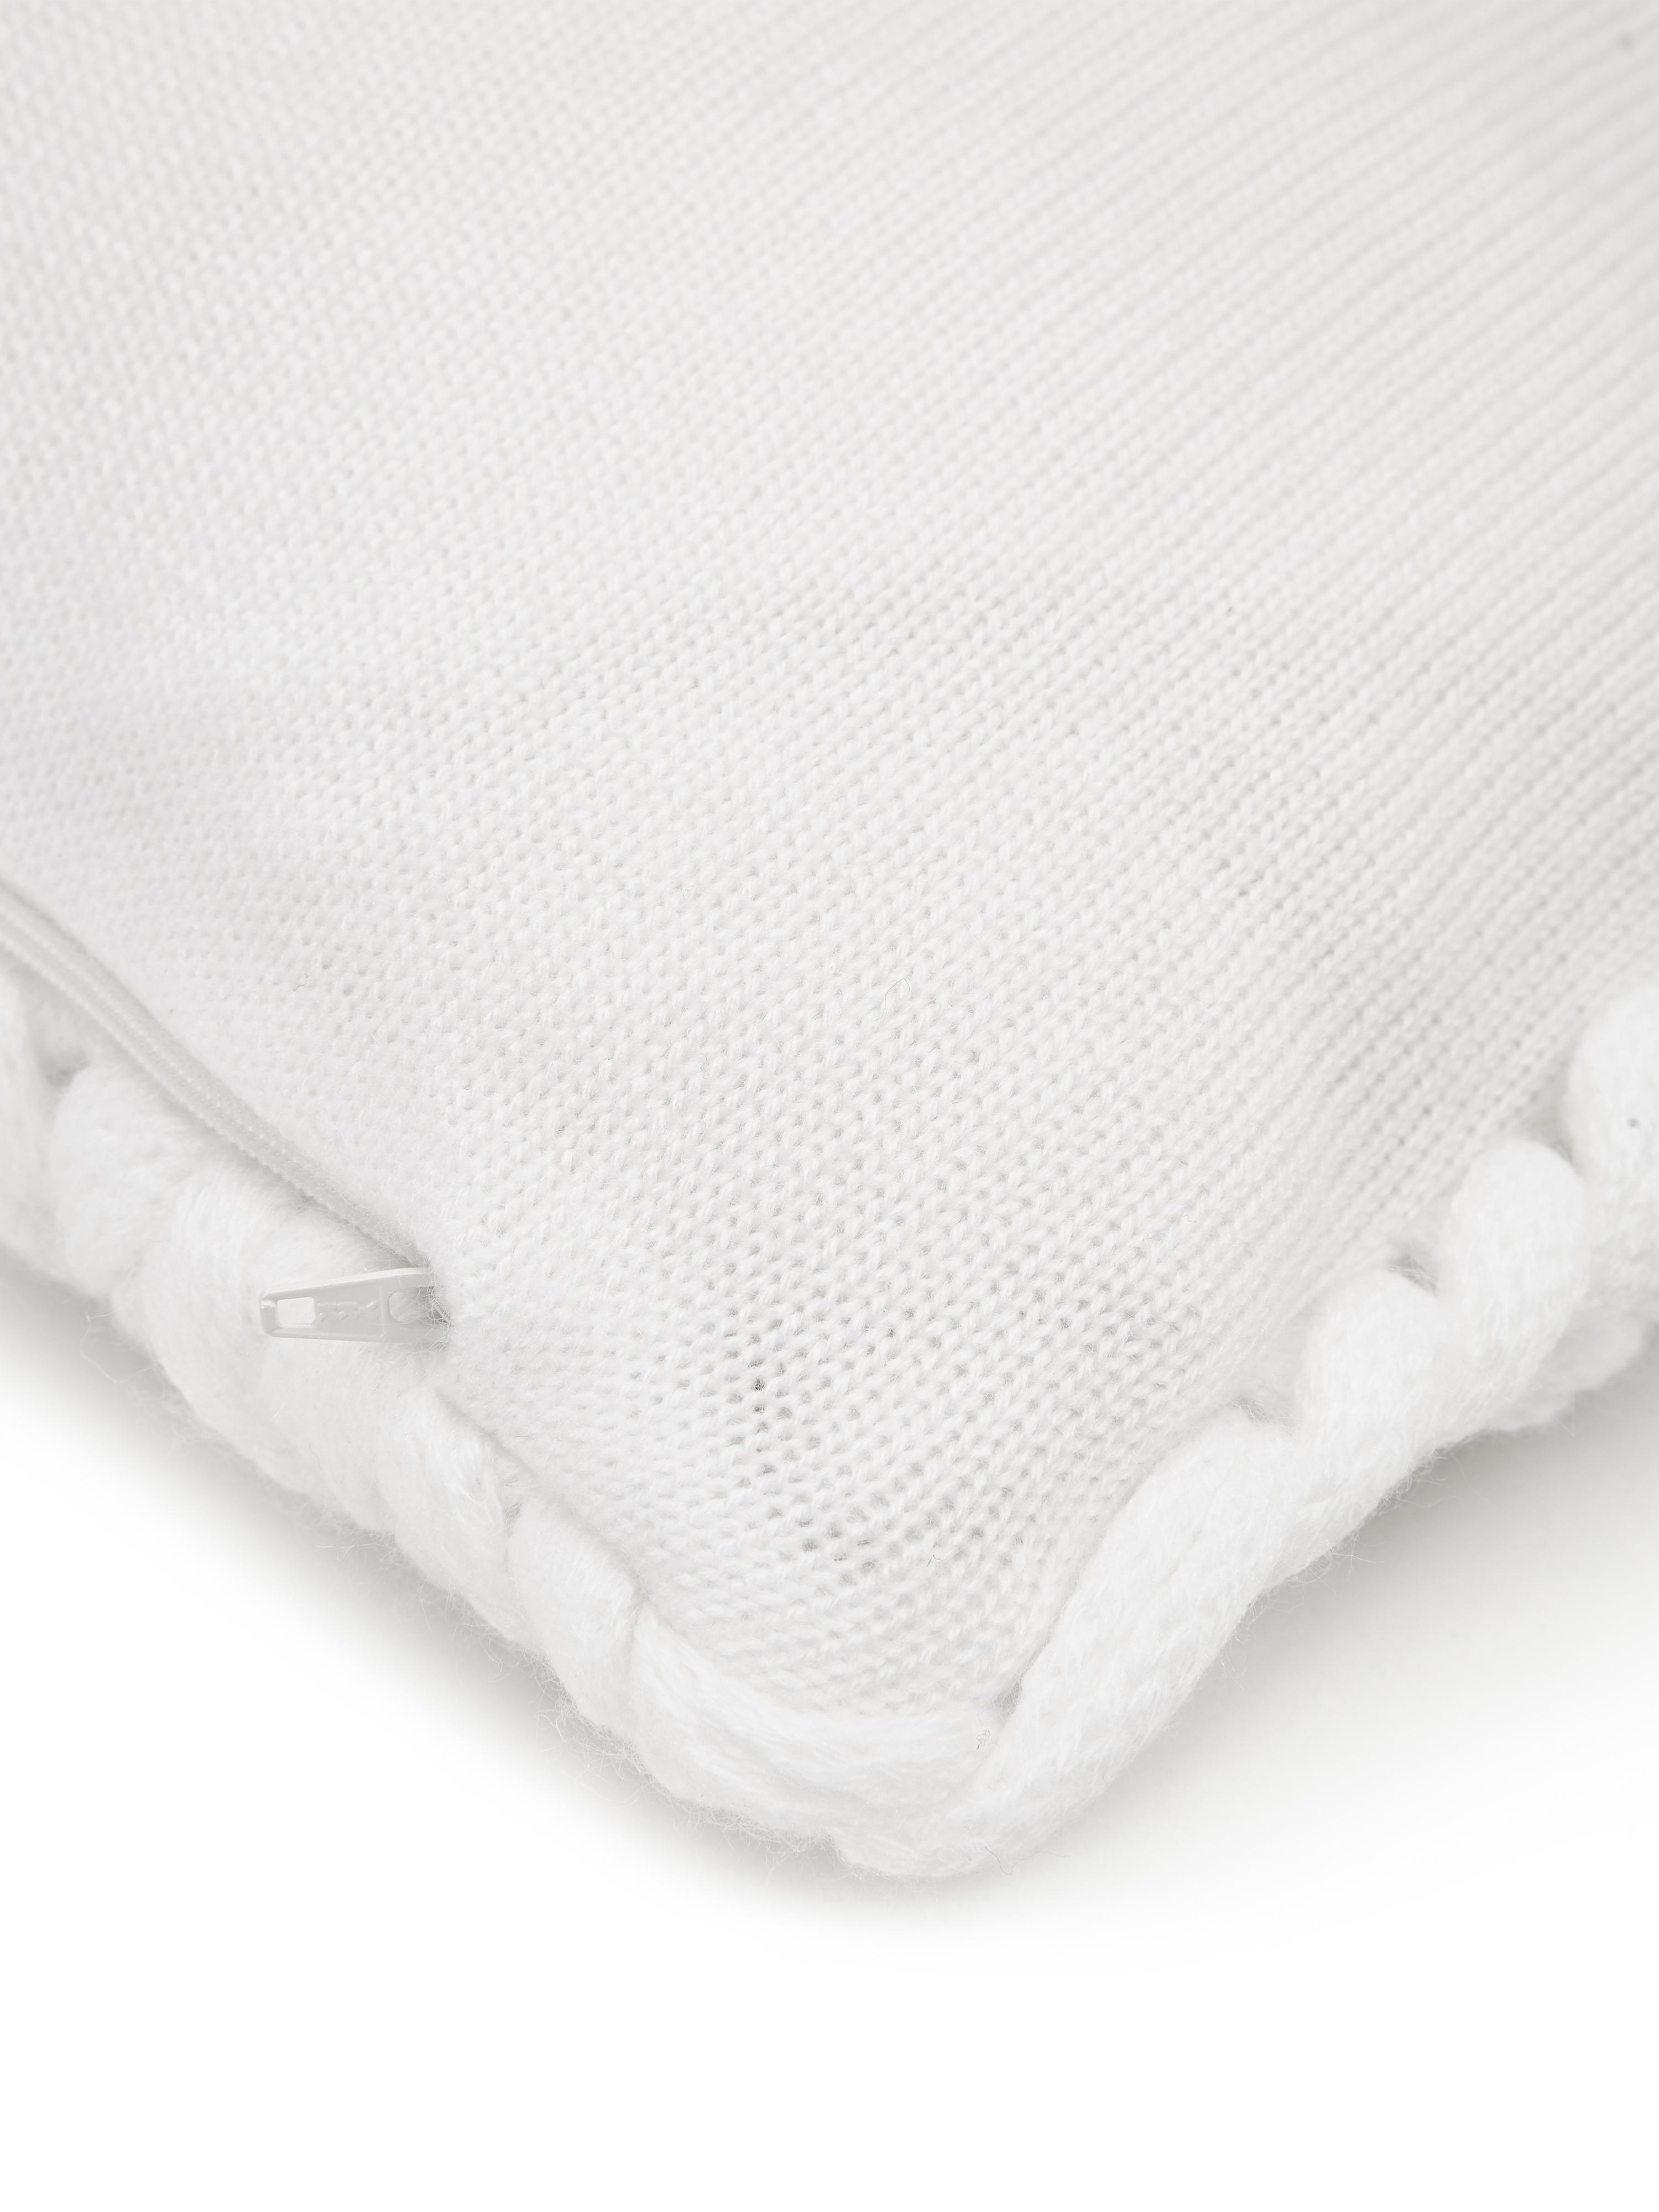 Pletený povlak na polštář Adyna, Krémově bílá